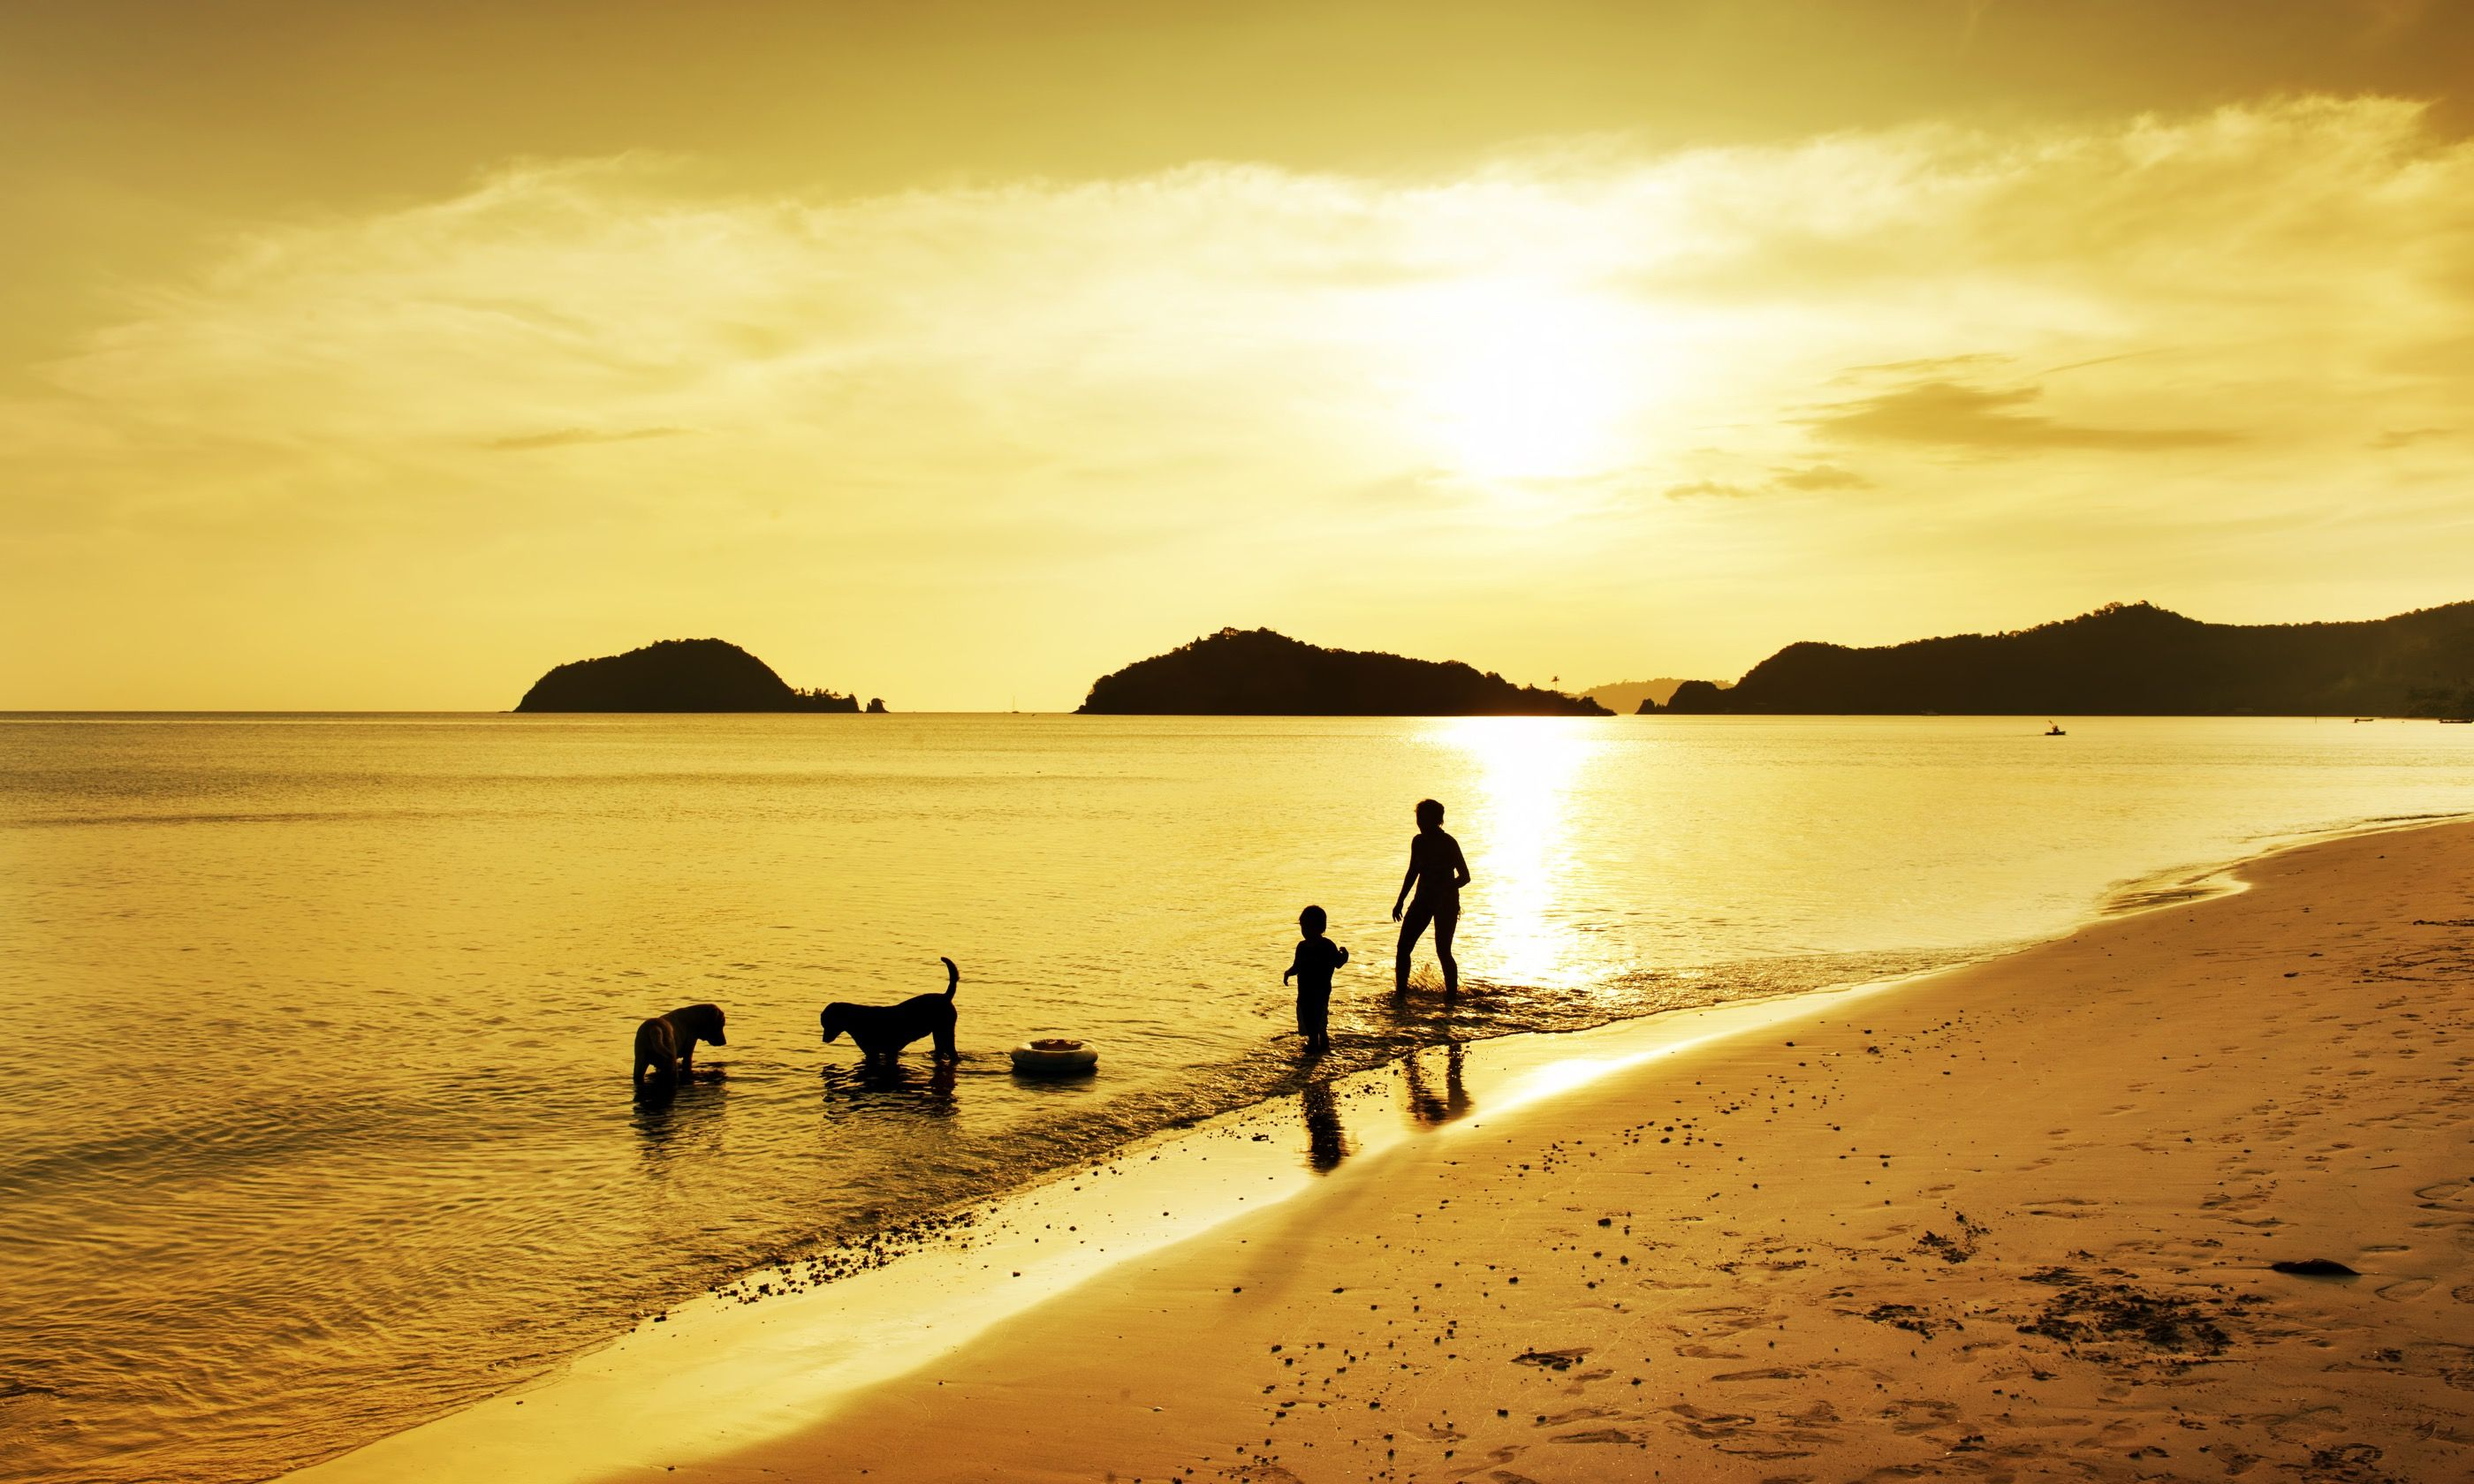 Family walking dog on beach (Shutterstock.com)